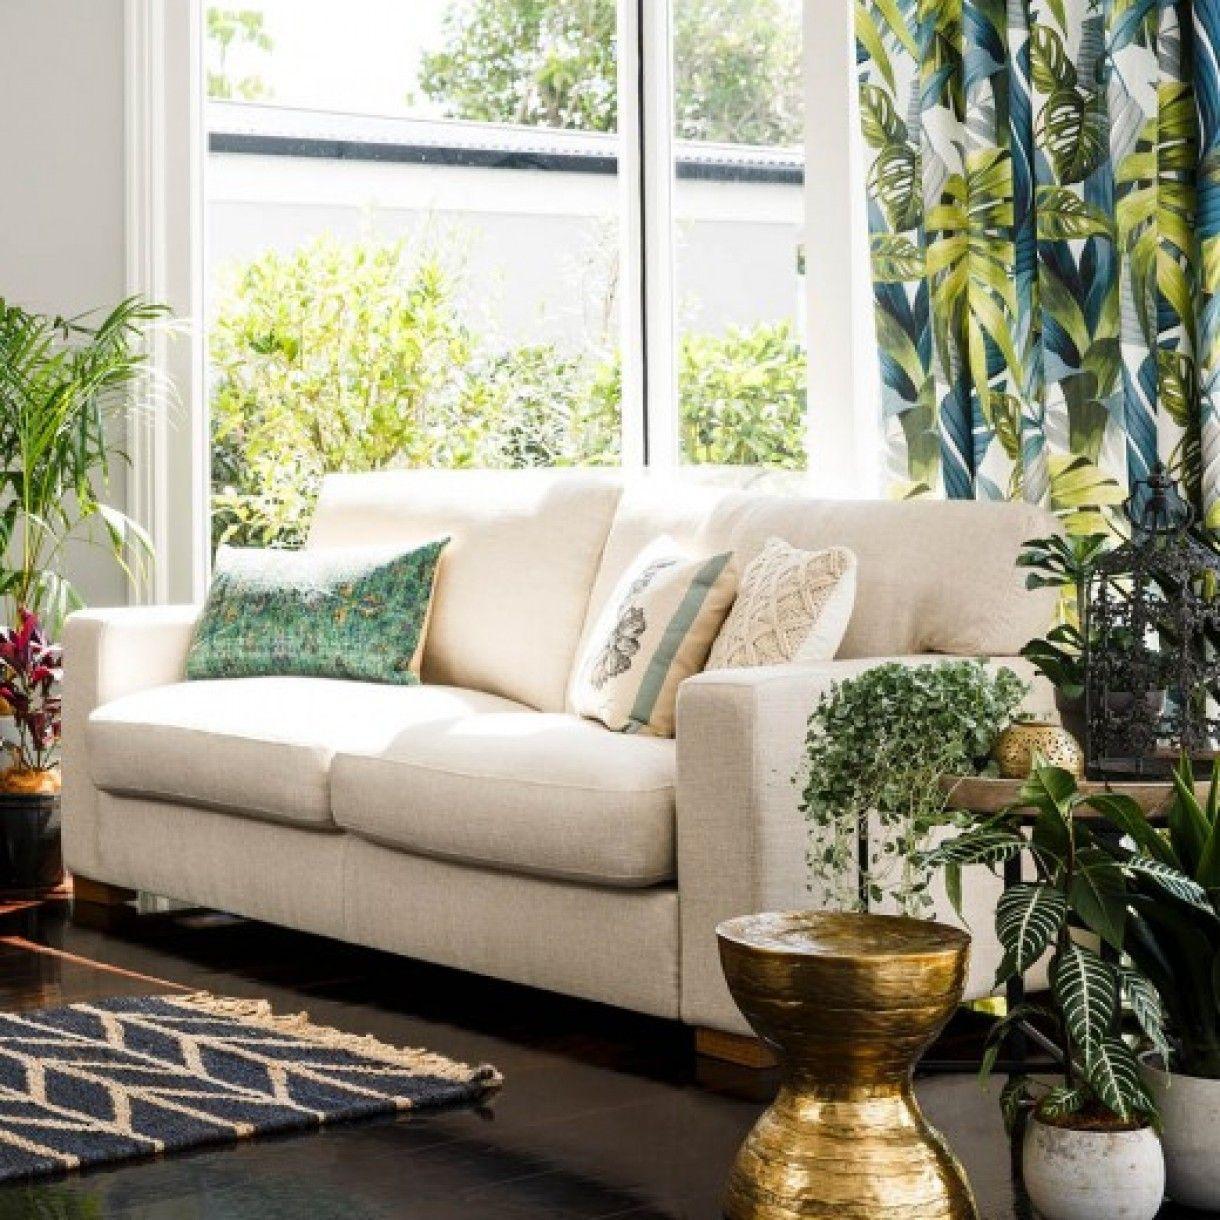 Carlisle 2.5 Seater Sofa Dublin Linen